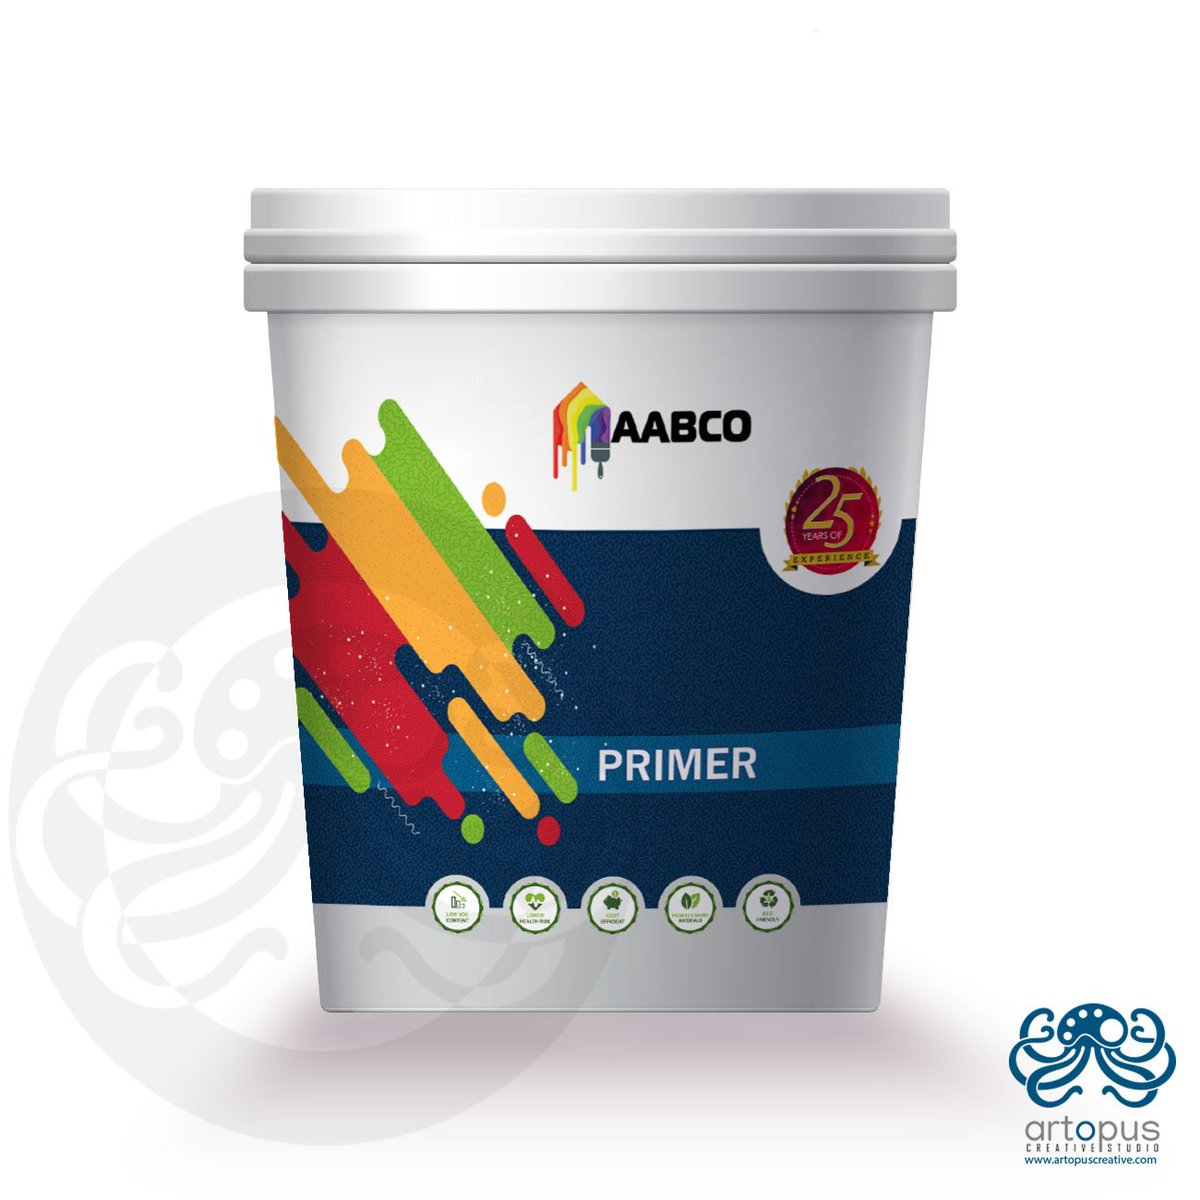 Artopus Creative On Twitter Aabco Eco Primer Paint Bucket Design Package Paint Bucket Design Graphics